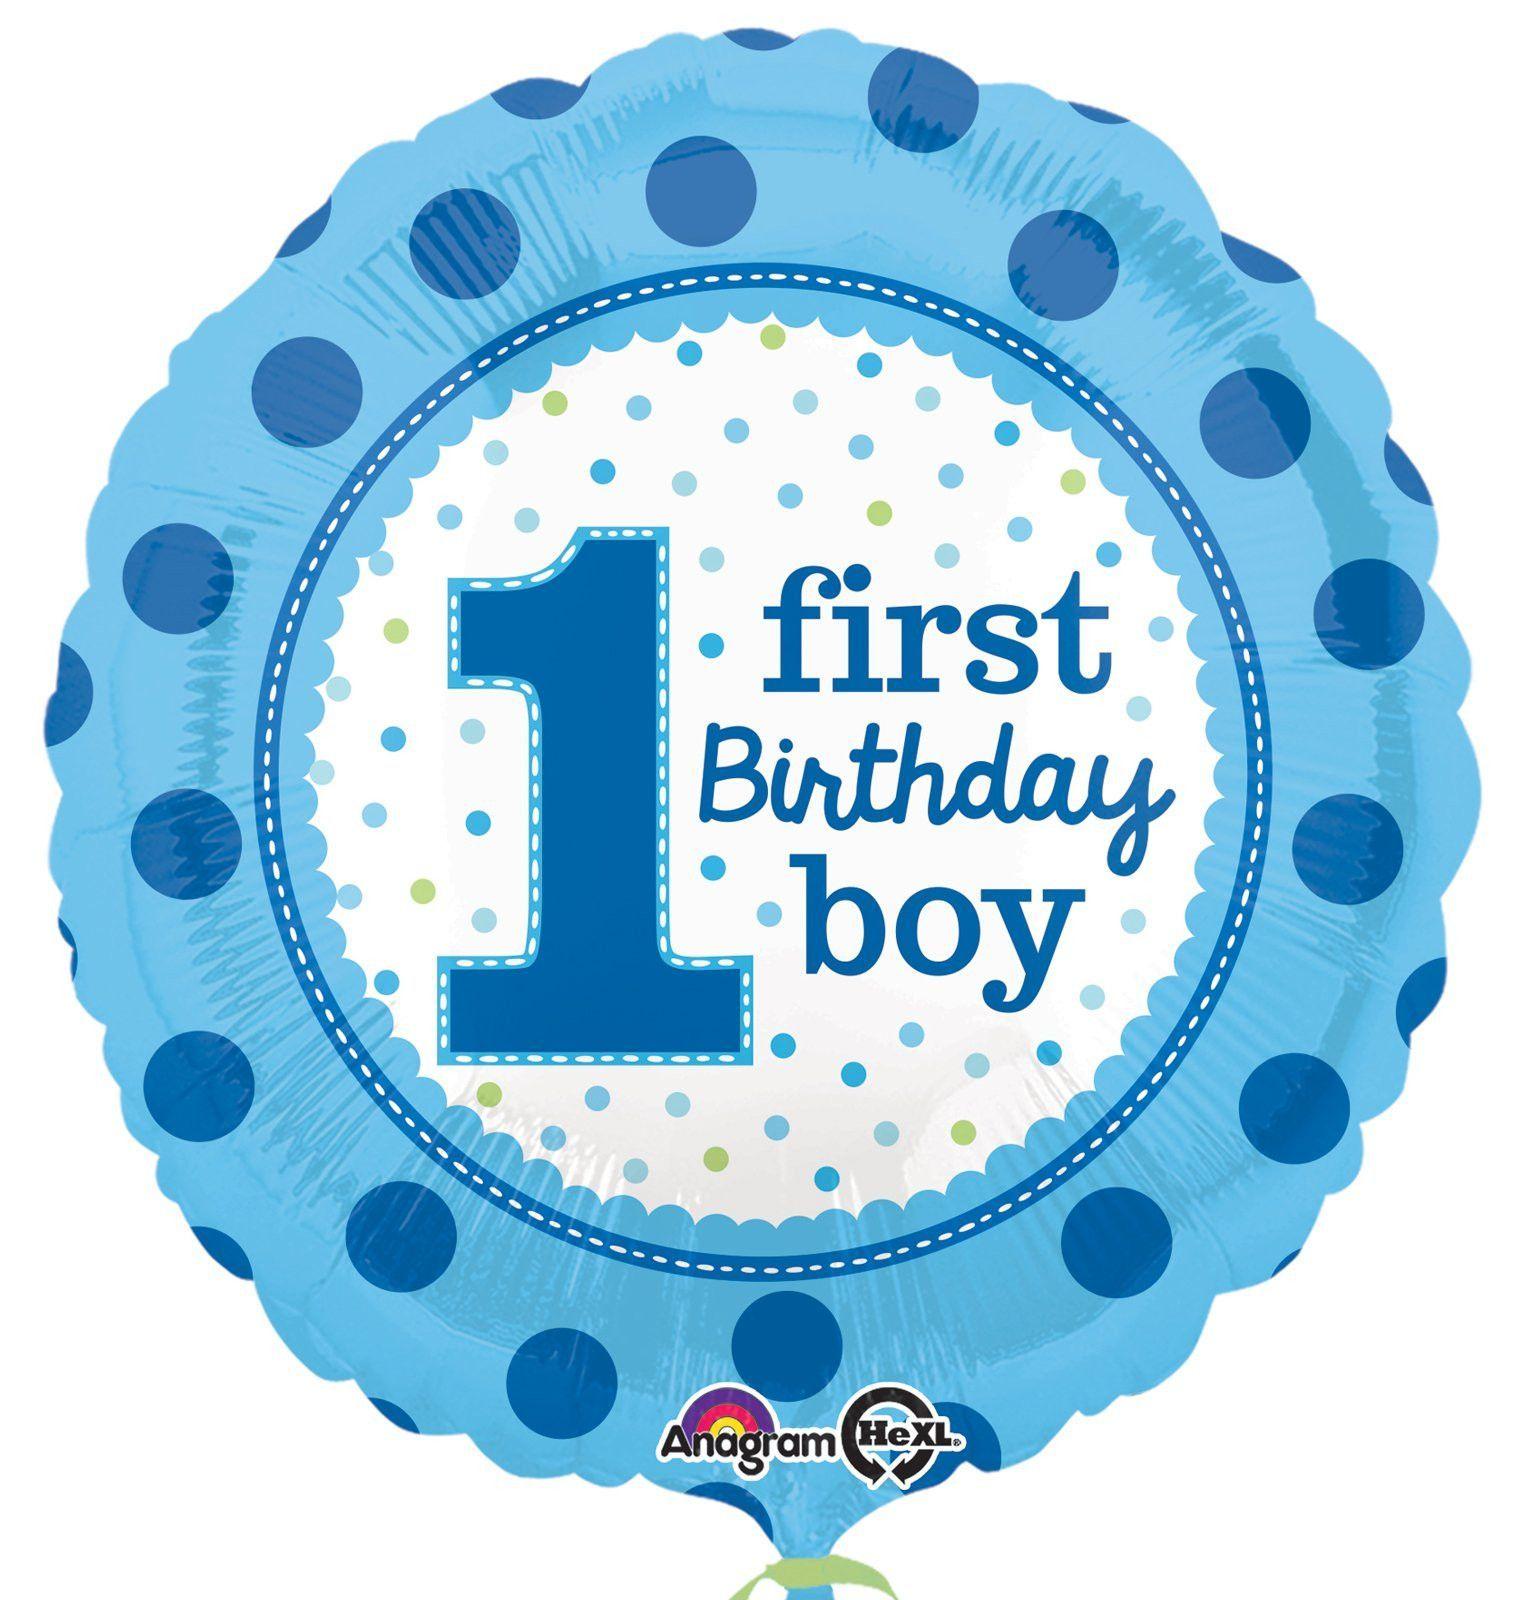 St birthday boy foil balloon products pinterest foil balloons